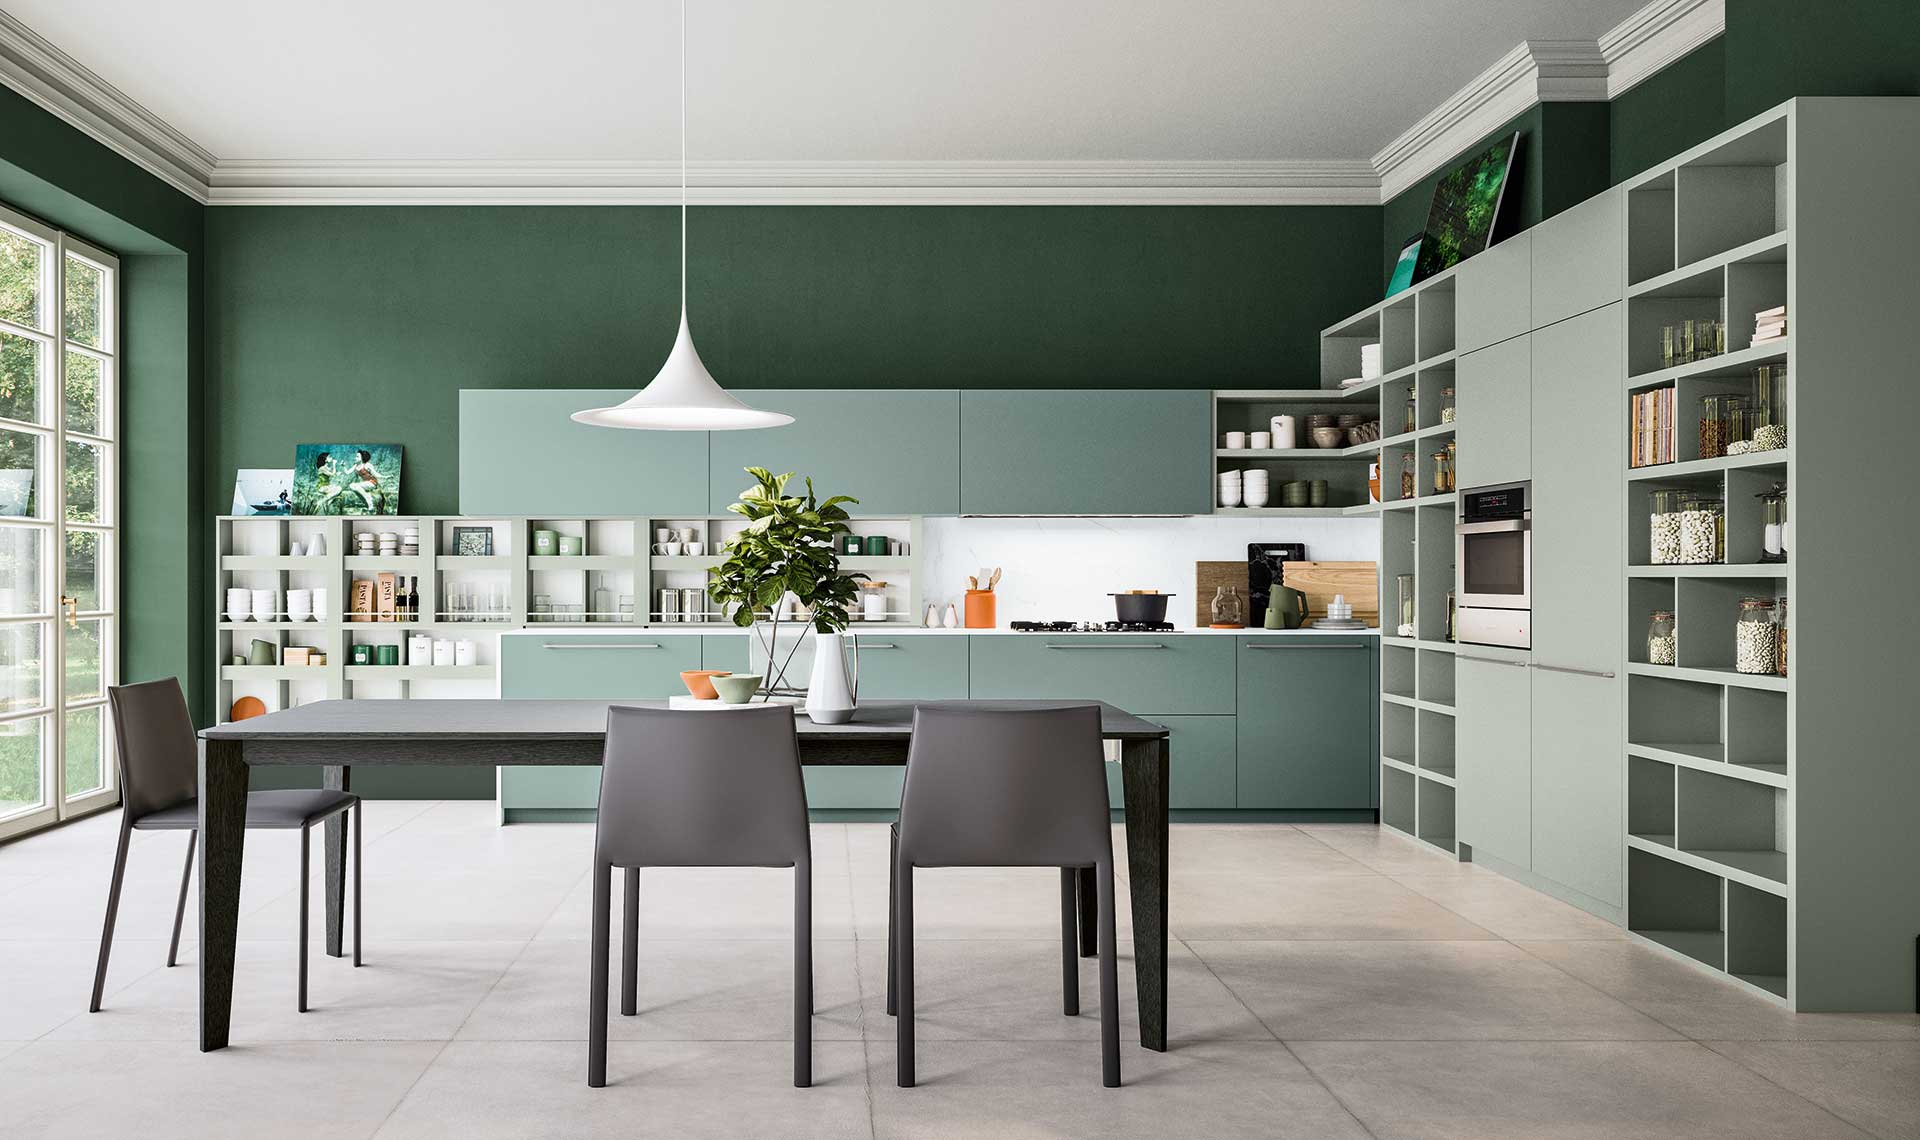 Meuble De Cuisine Laqué cuisine laquée verte - meubles aubin